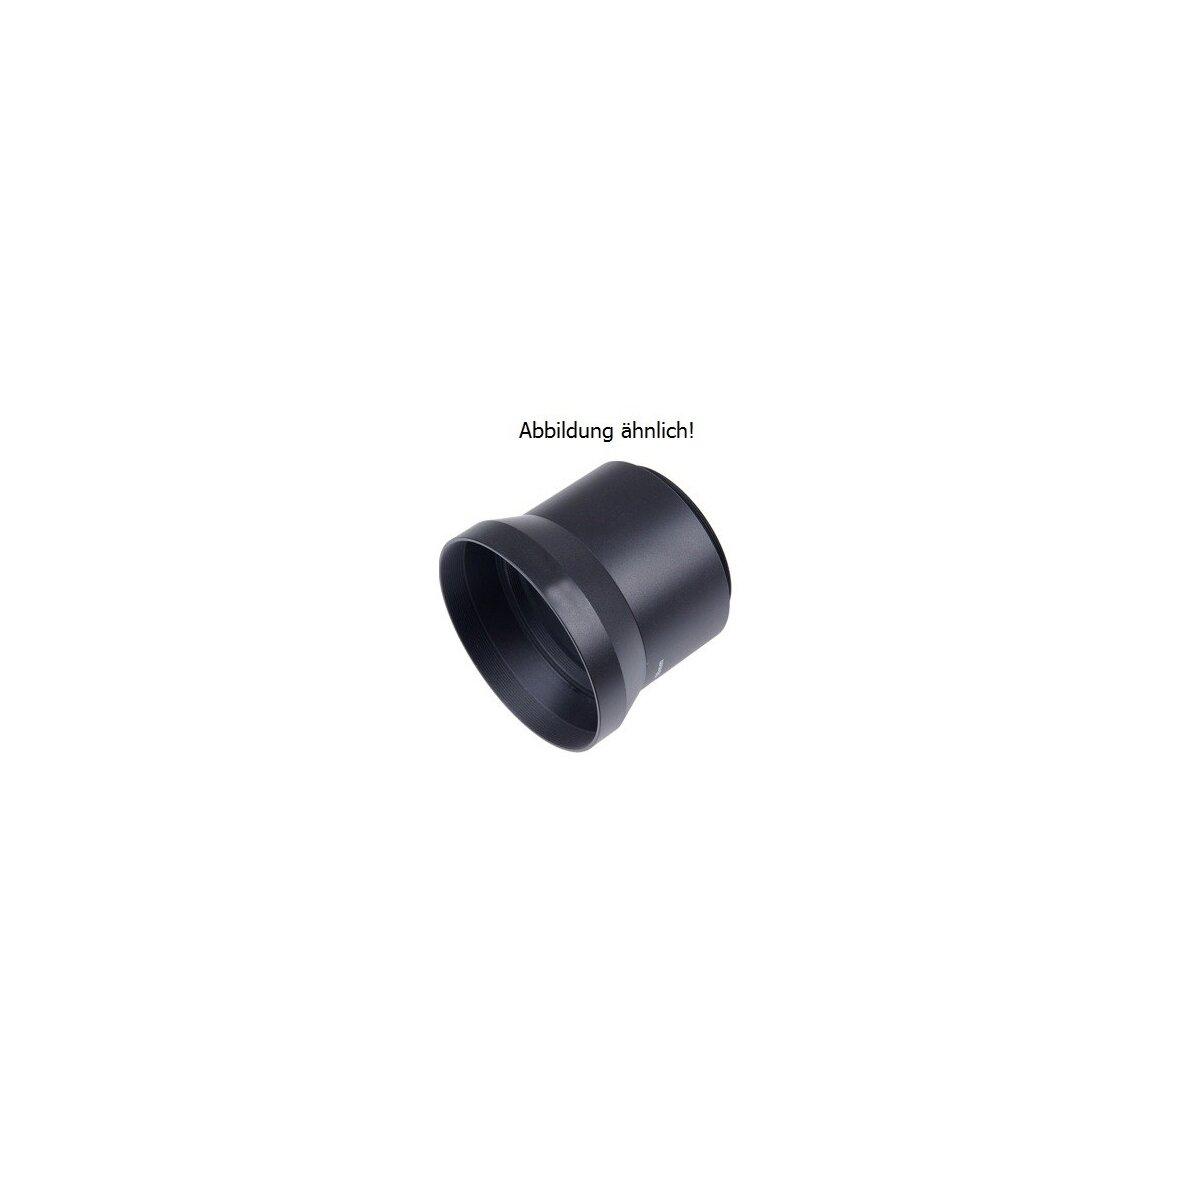 Adaptertubus fuer Canon PowerShot G7, G9 mit 58mm